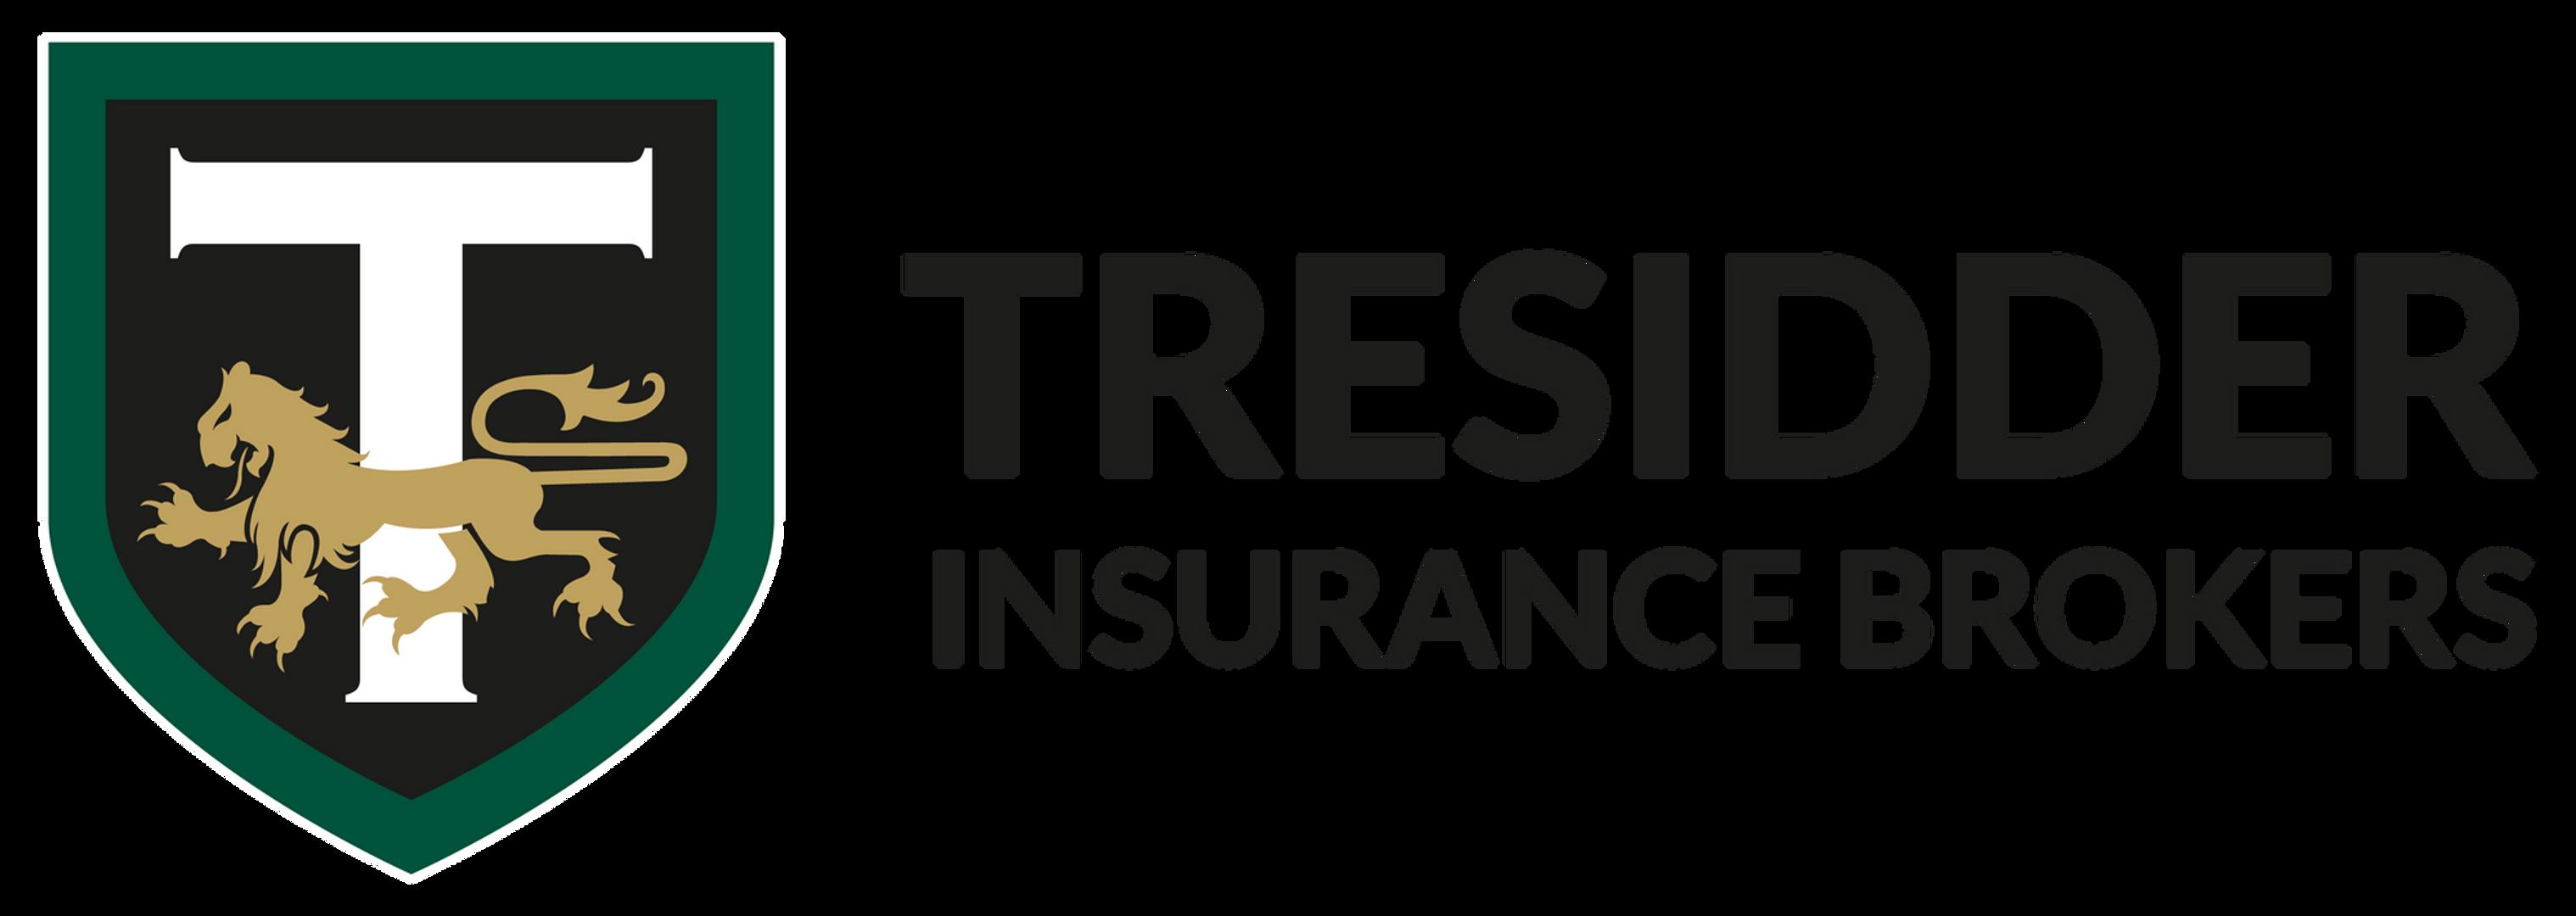 Tresidder | Insurance Brokers